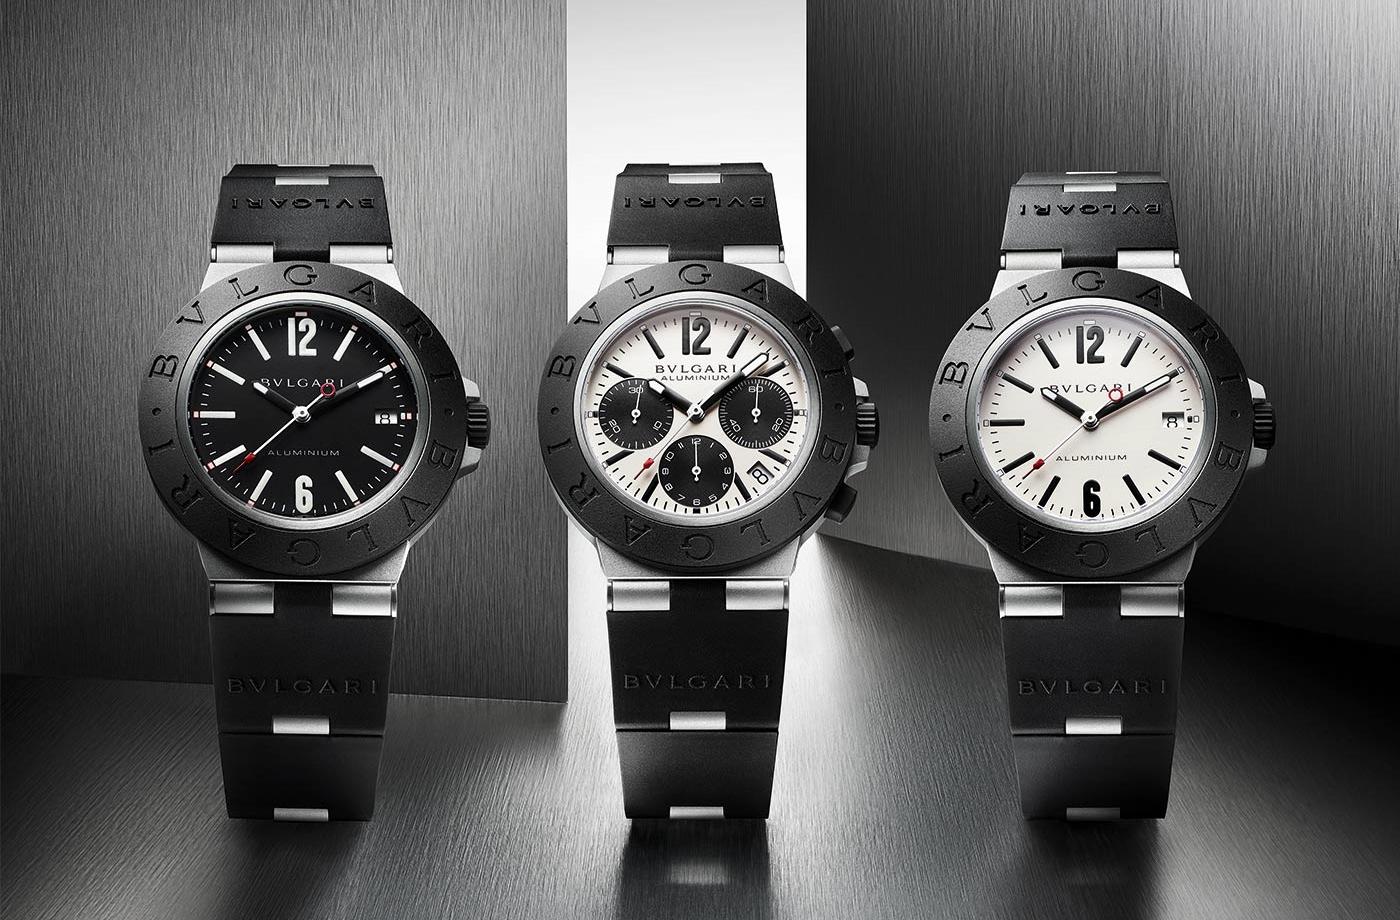 Nuevos relojes Bvlgari Aluminium/Foto: Bvlgari.